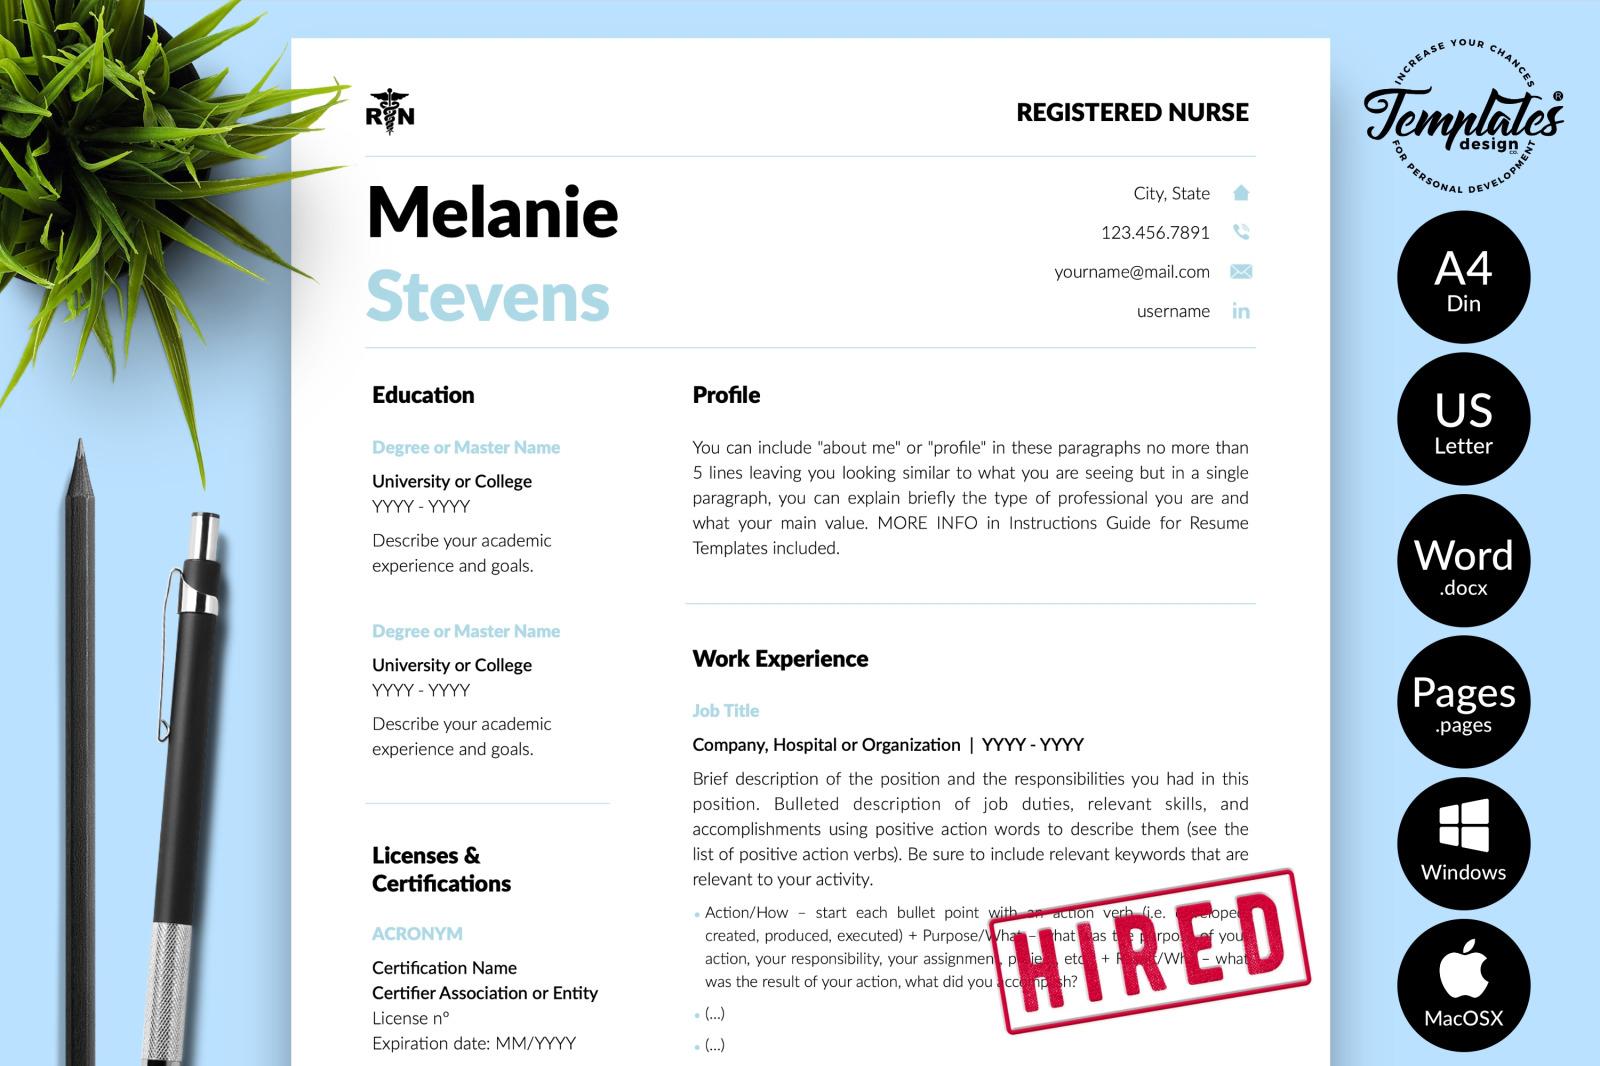 Nurse Resume Template for Microsoft Word & Apple Pages // Melanie Stevens CV Design Template